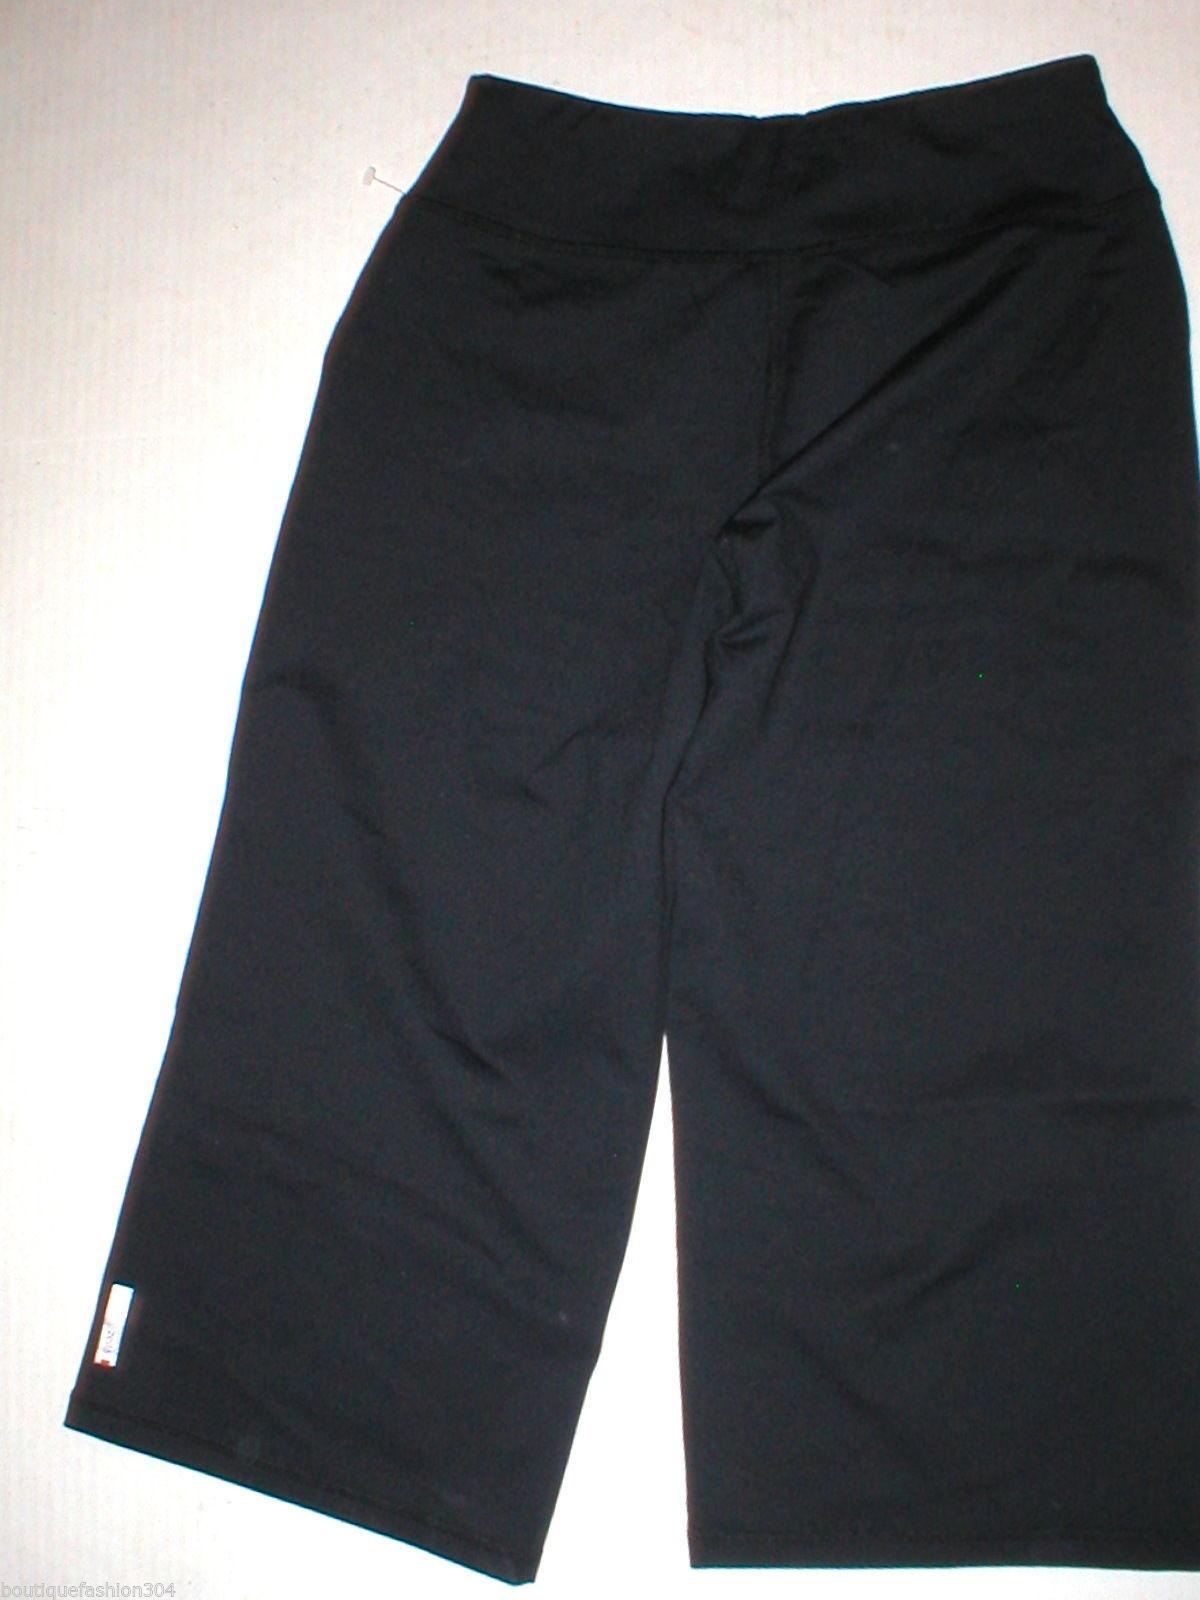 Women New Zella Nordstrom Pants Gym 0 Black Crop Capri Soul 2 Barre Yoga Pilate image 4